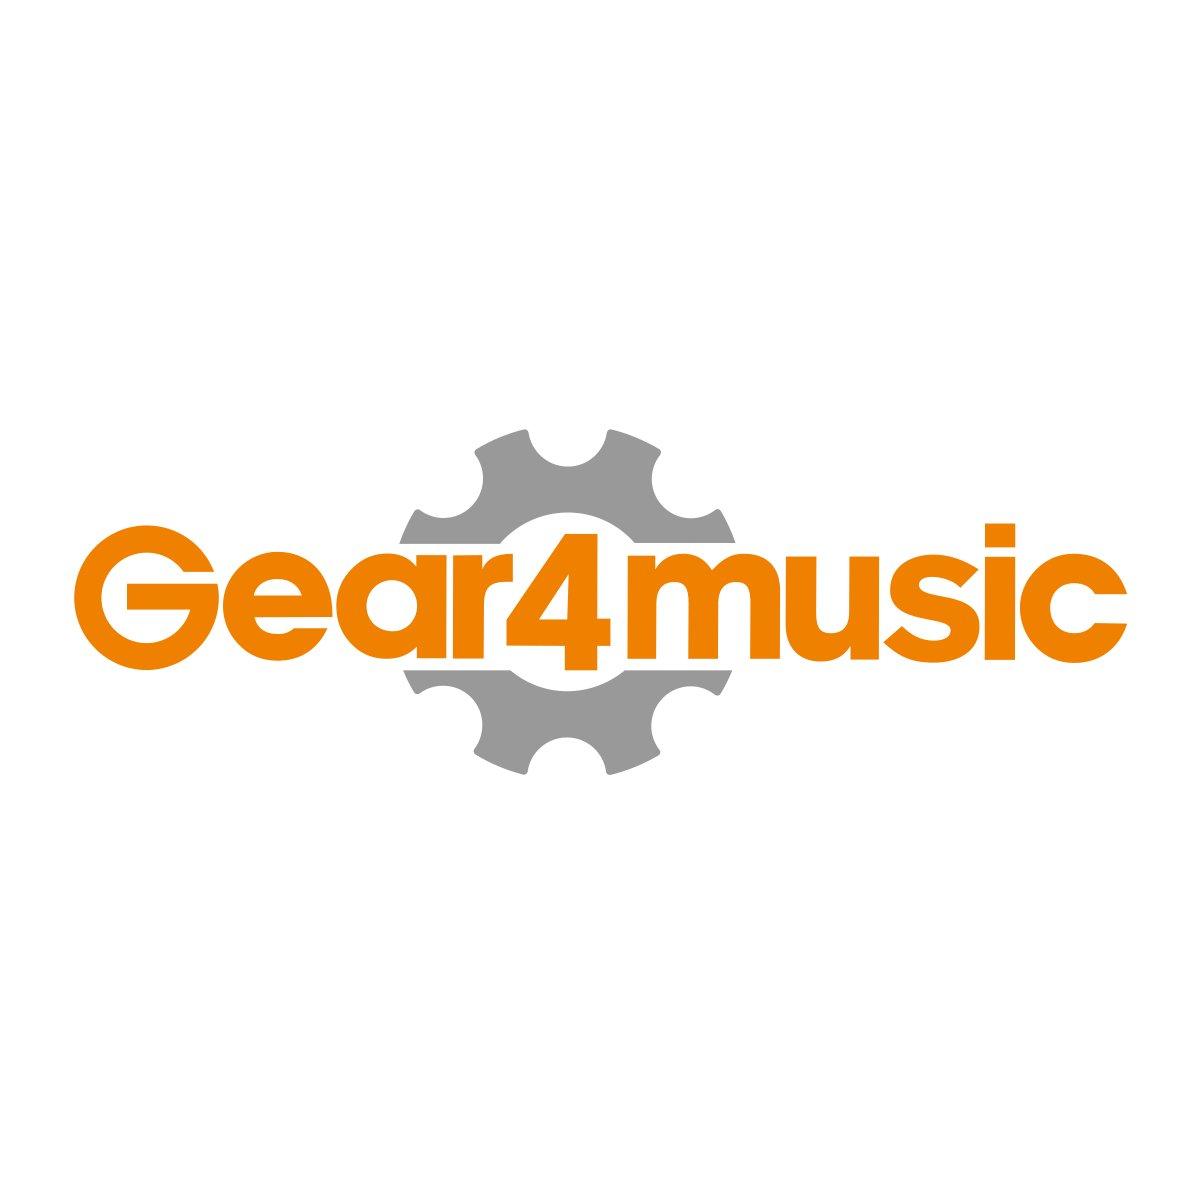 roland fa 07 music workstation at gear4music. Black Bedroom Furniture Sets. Home Design Ideas